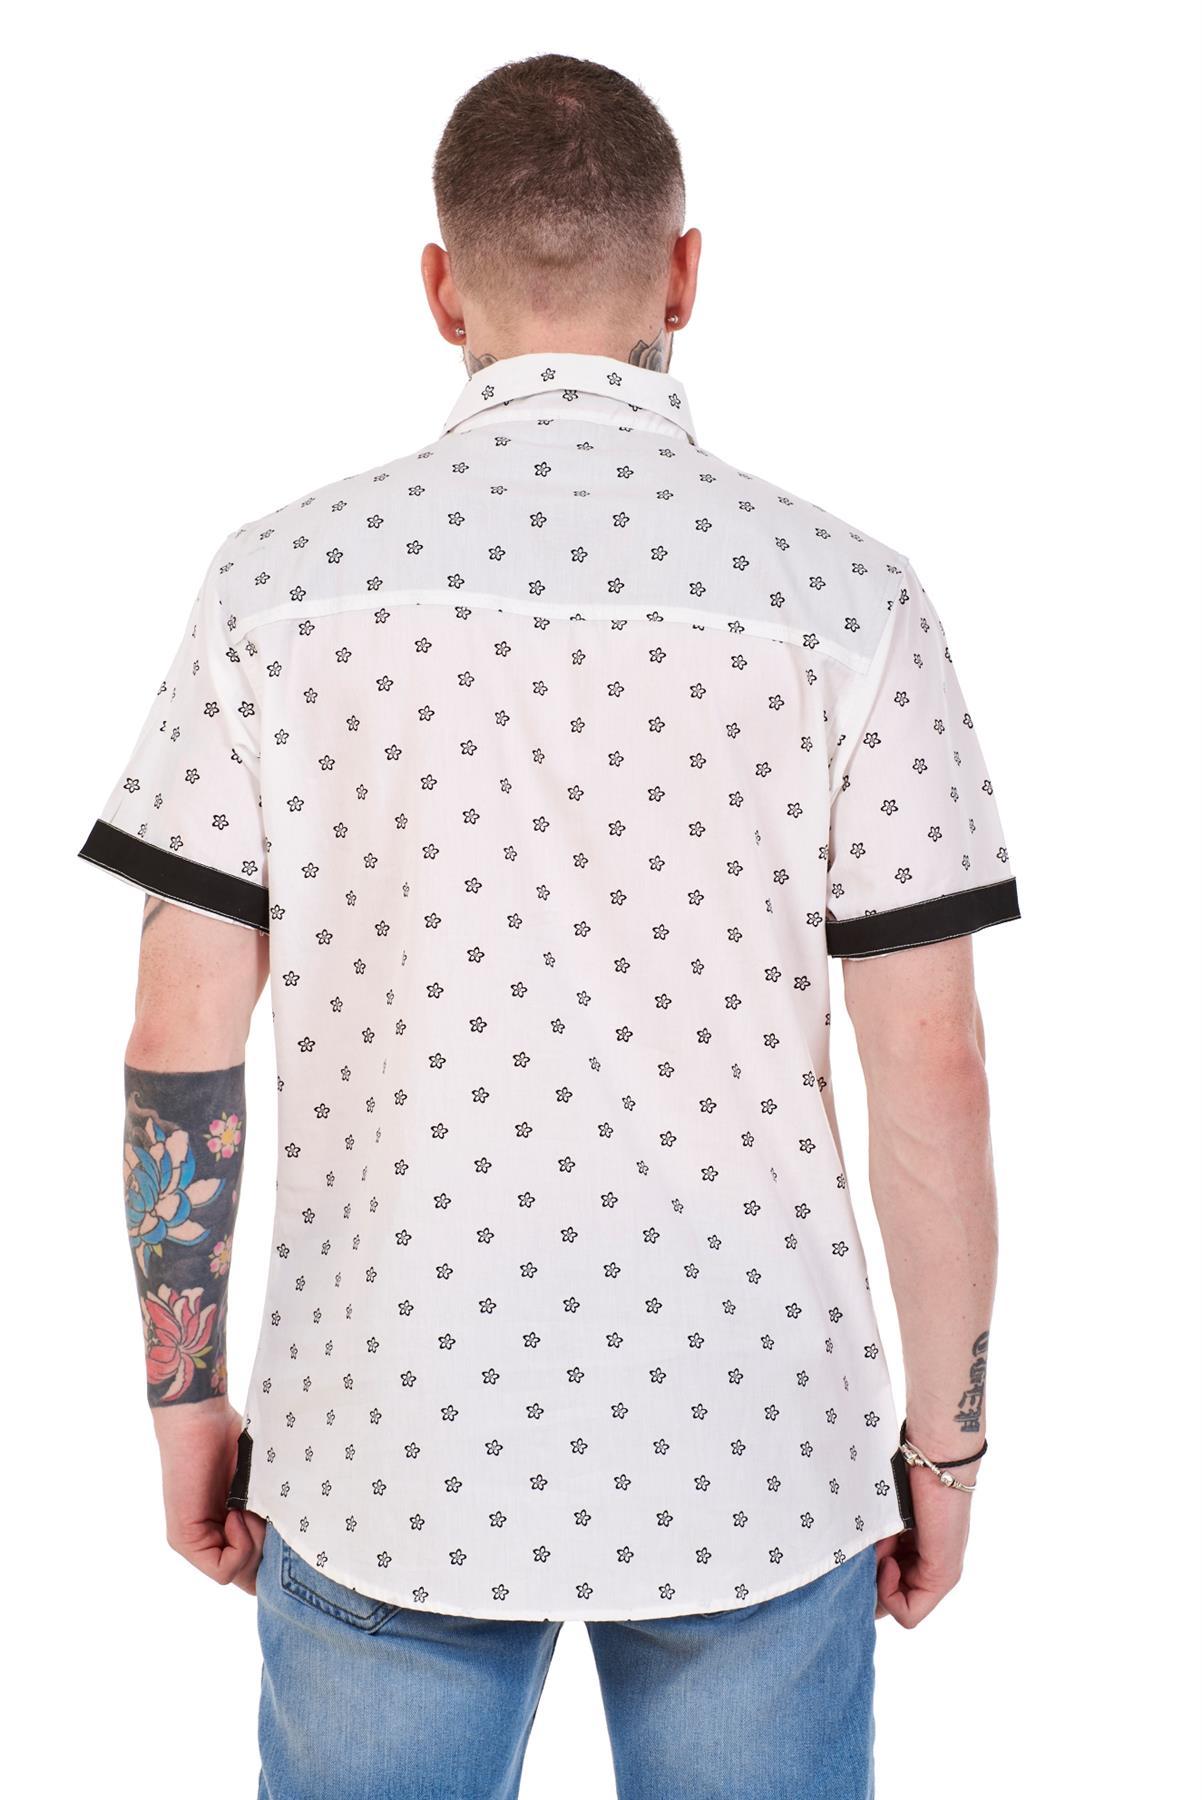 Mens-100-Cotton-Printed-Shirt-Short-Sleeve-Regular-Big-Size-Casual-Top-M-to-5XL thumbnail 20